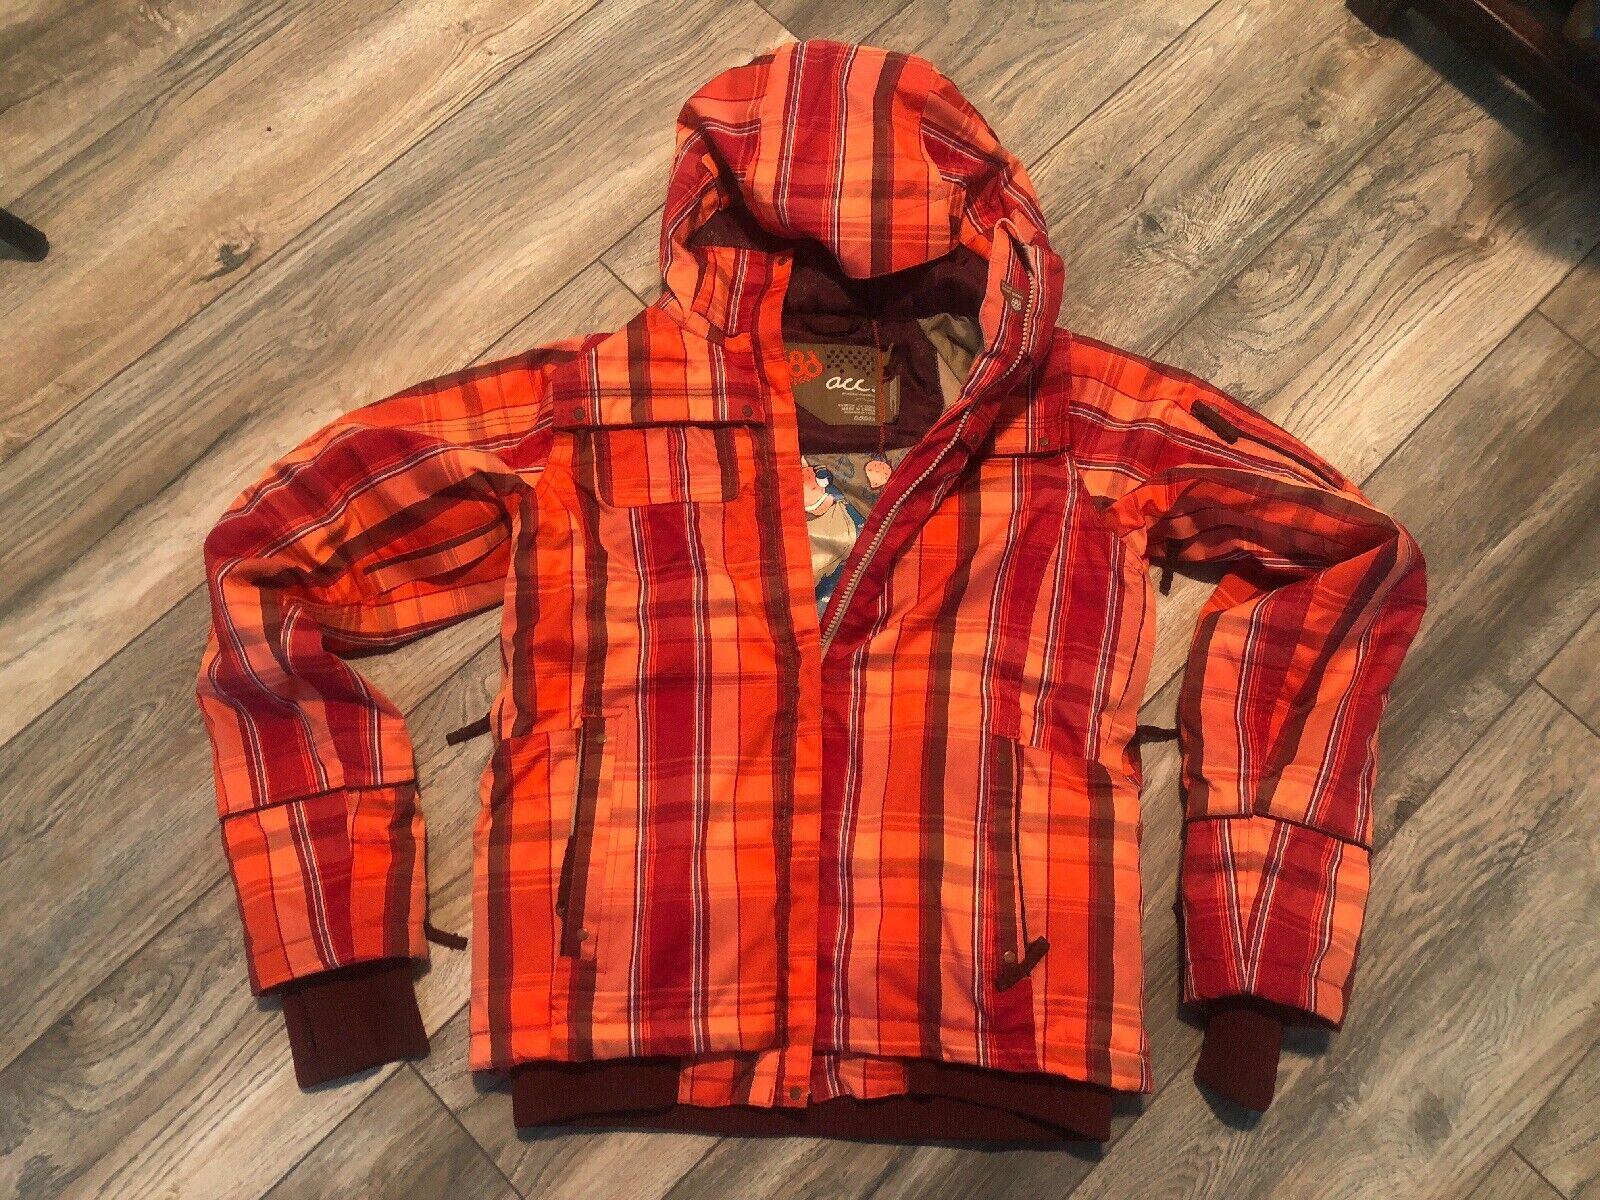 686 damen ACC Caliber Snow Jacket Größe Small New Condition